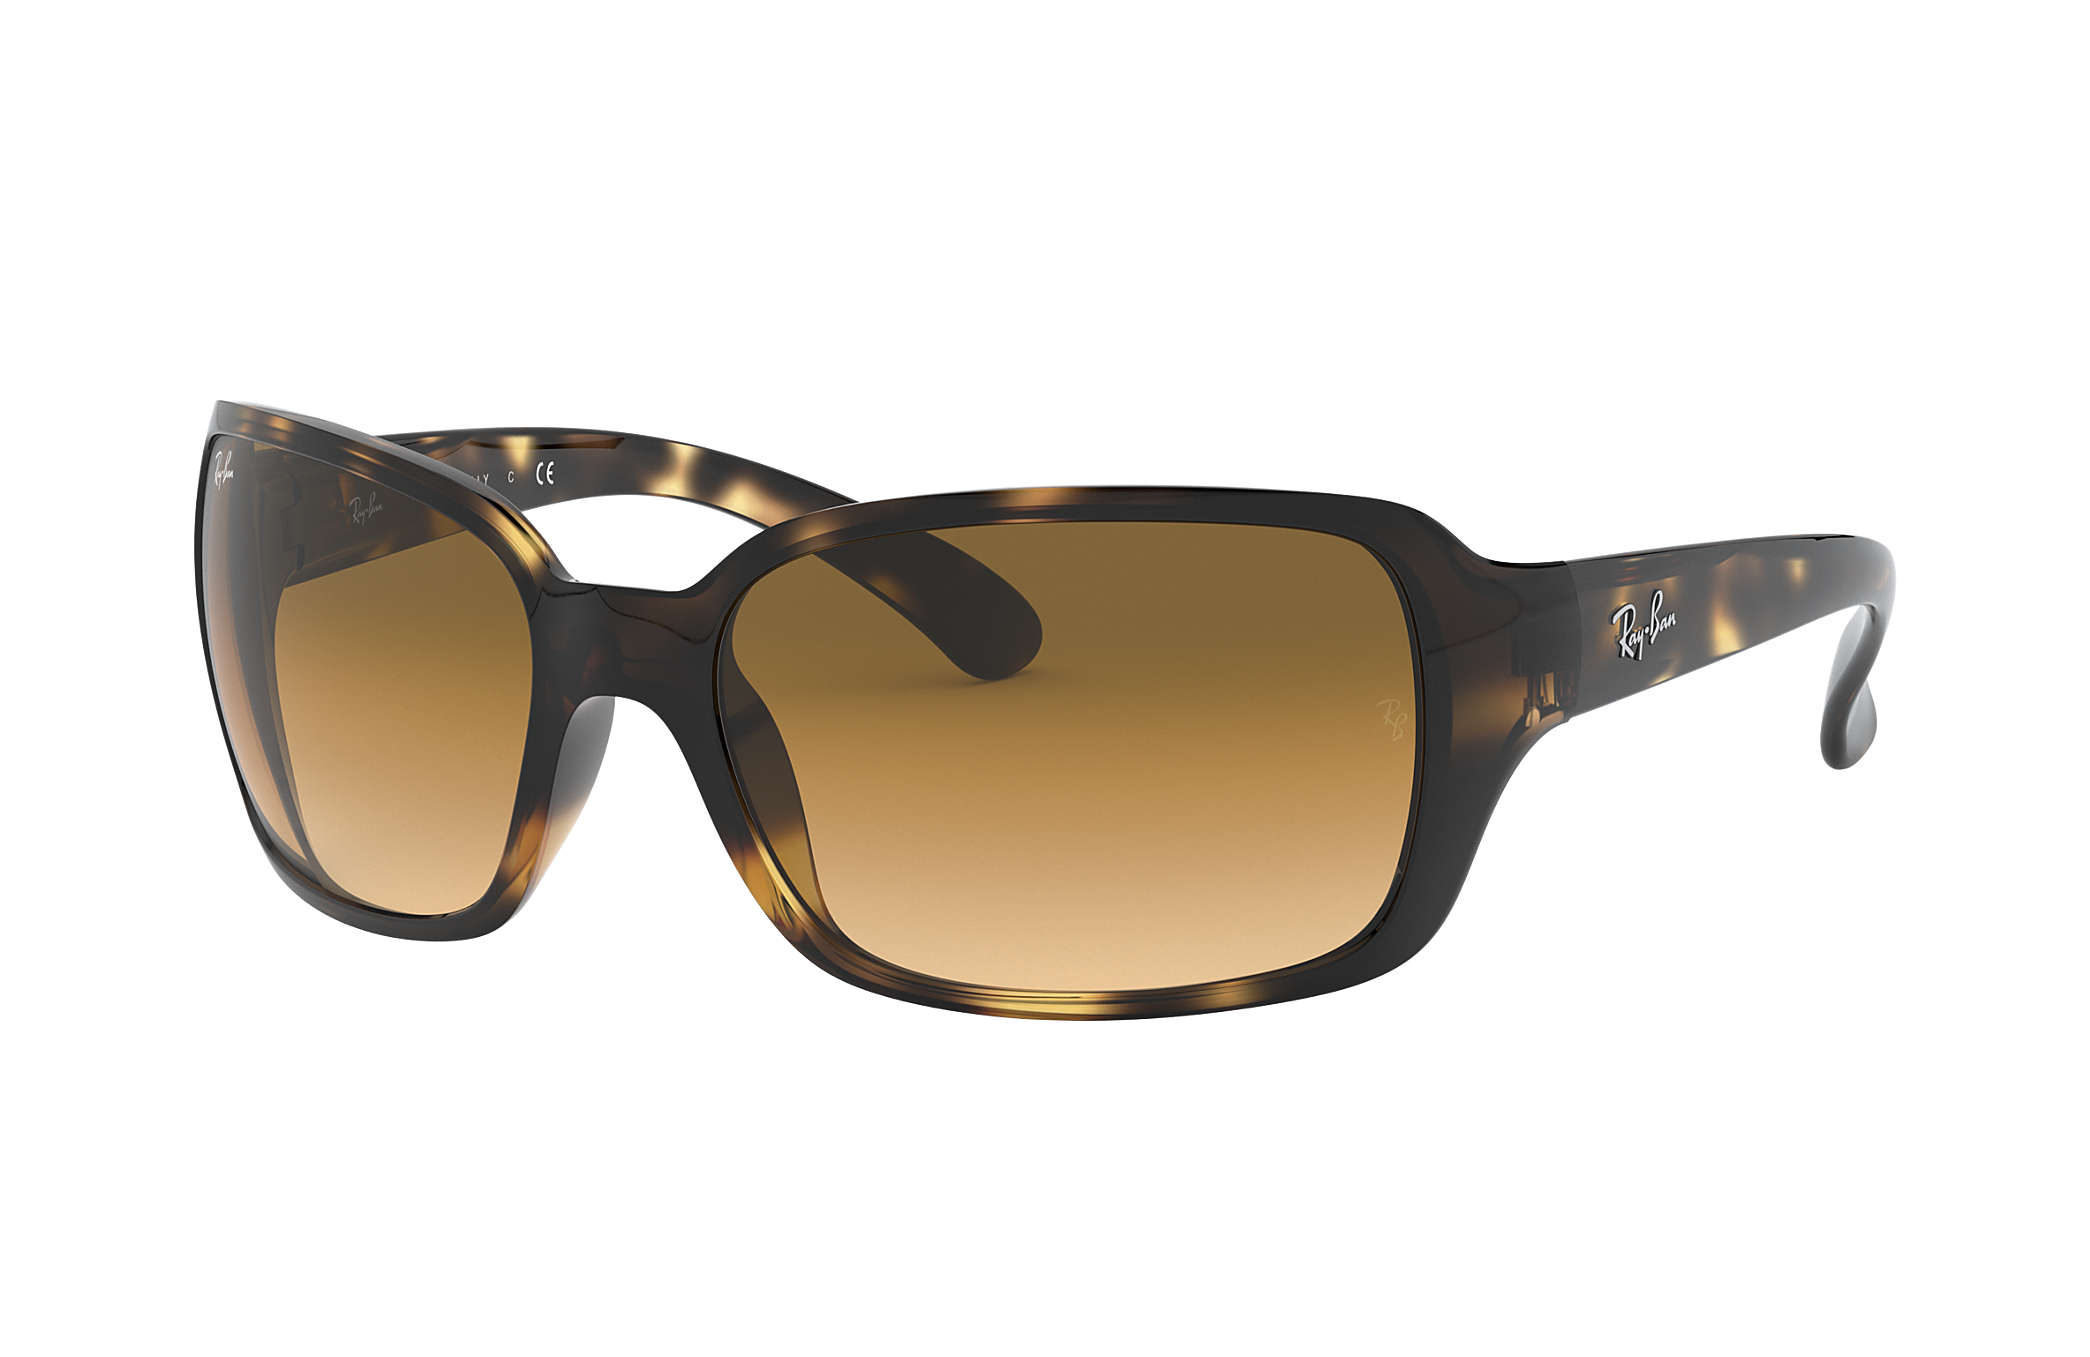 a80b41cc190 Ray-Ban RB4068 Tortoise - Nylon - Light Brown Lenses - 0RB4068710 ...